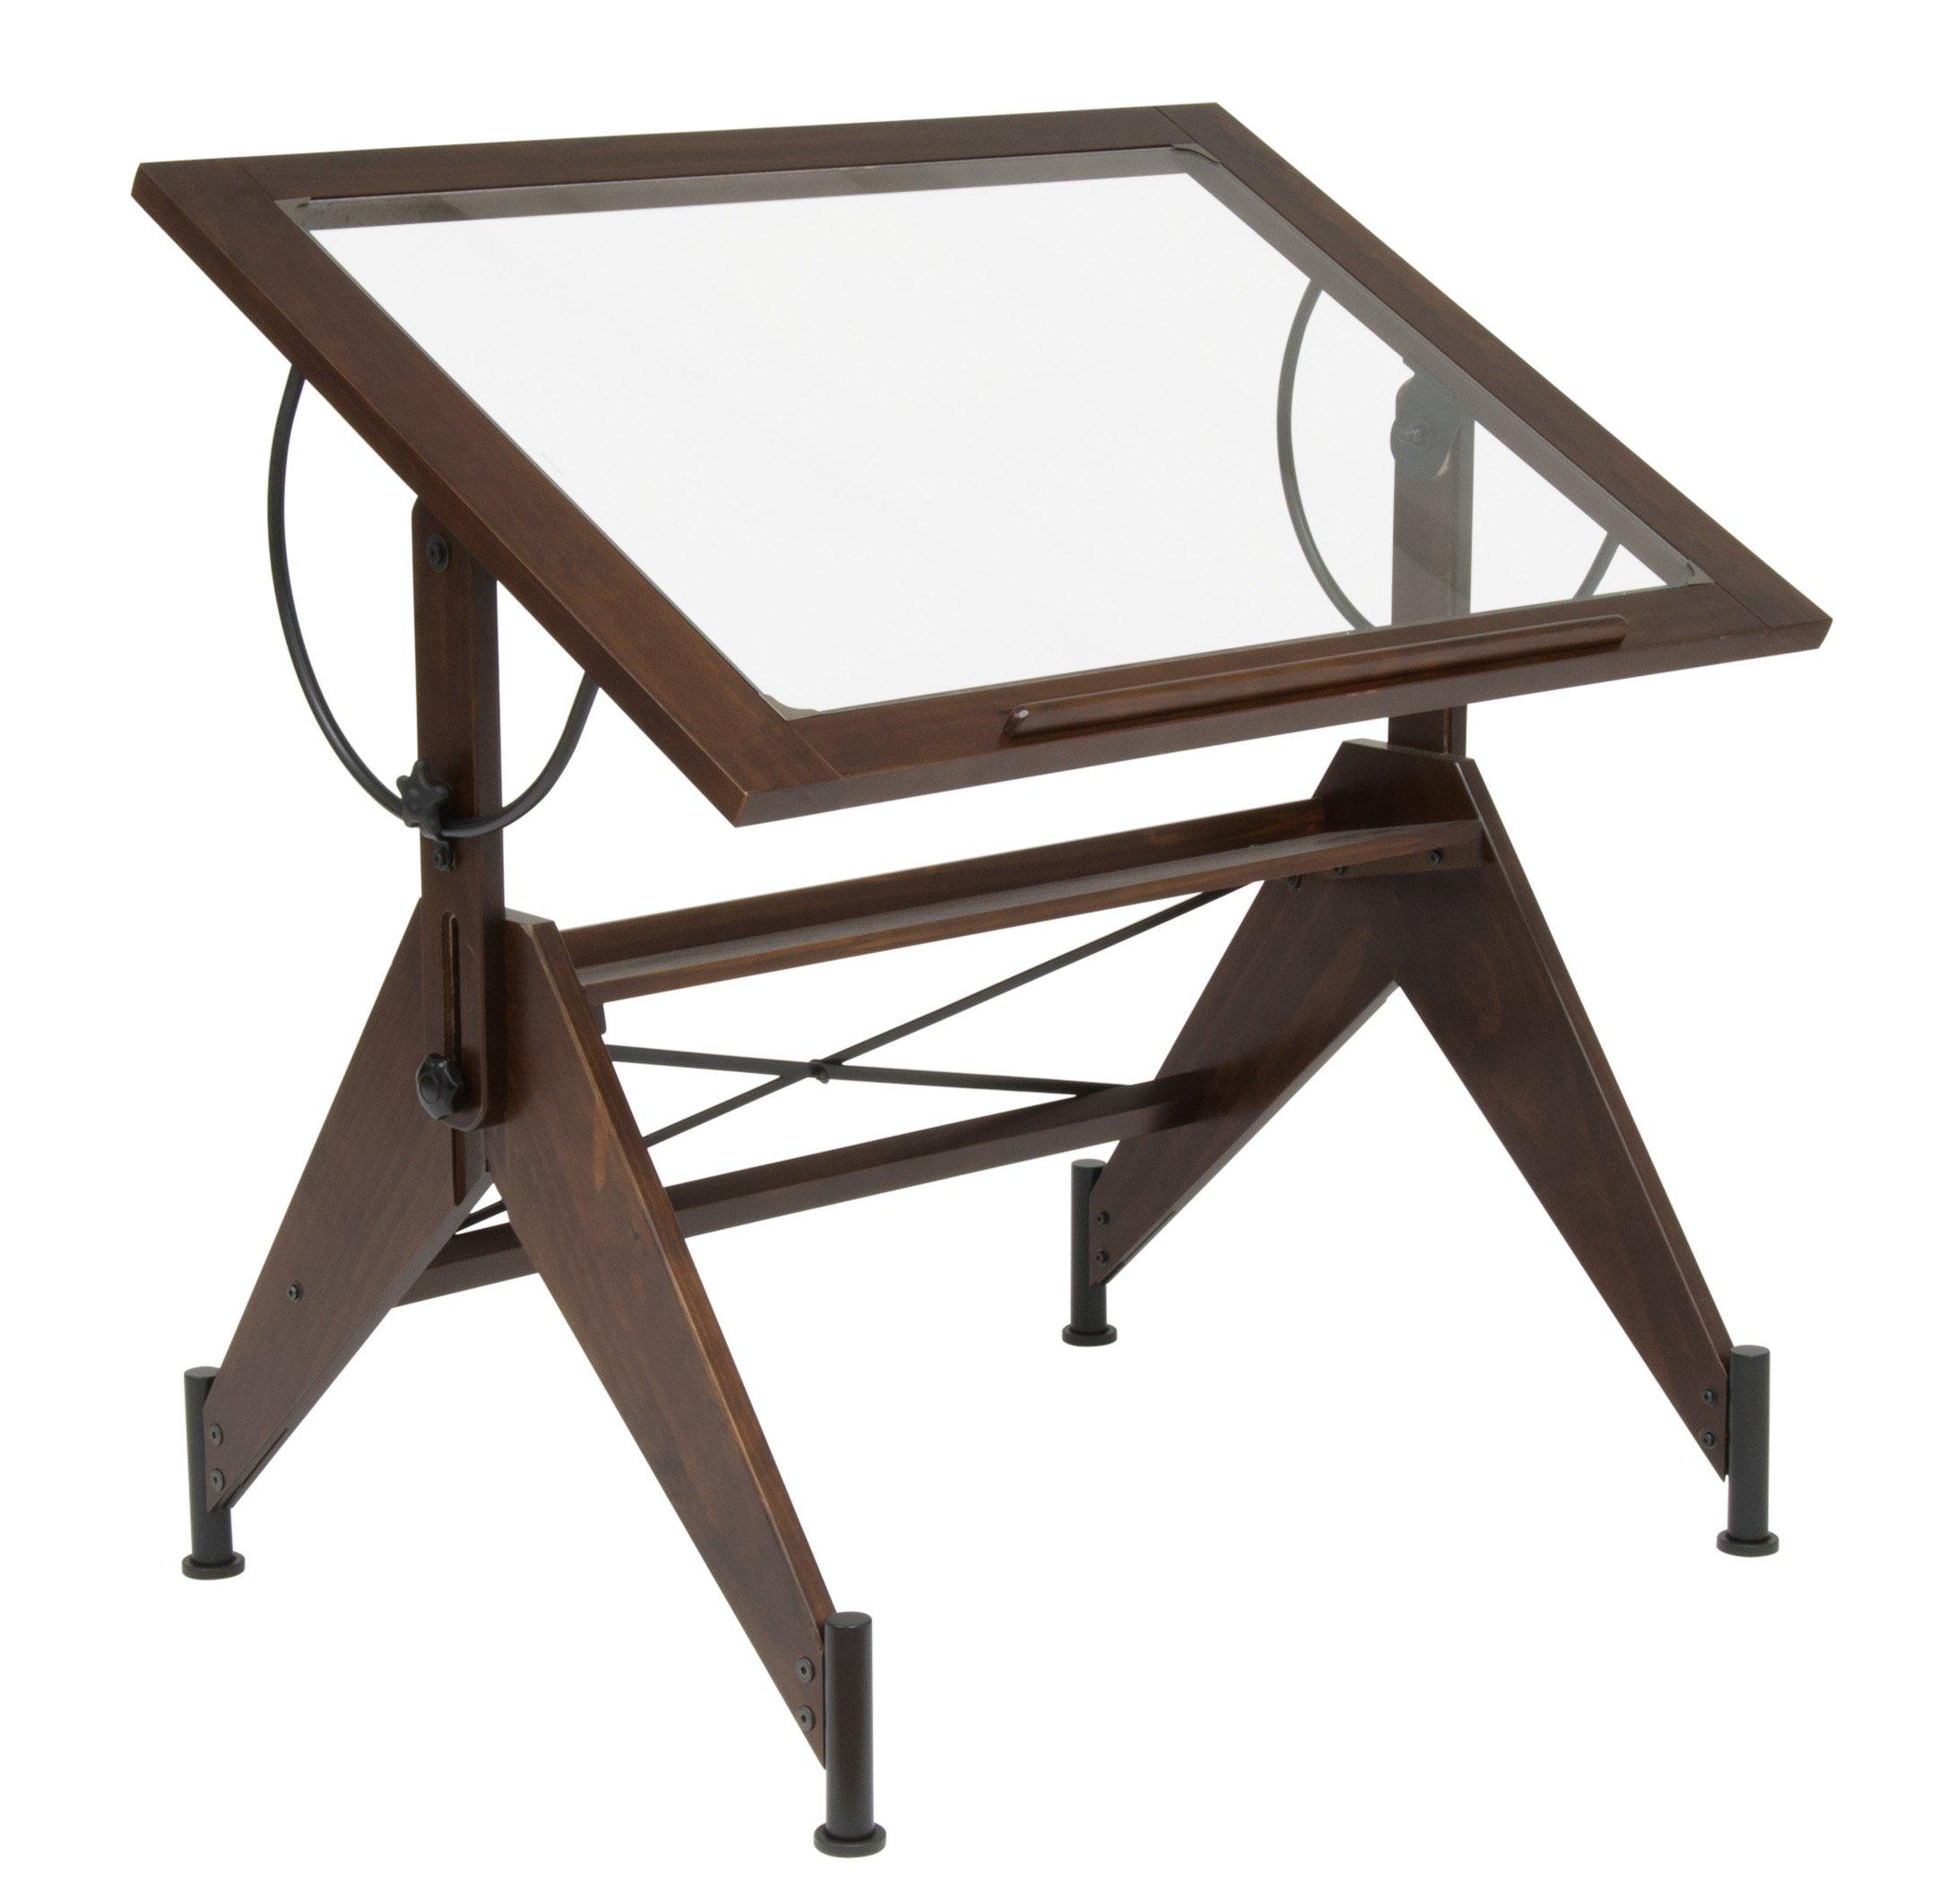 STUDIO DESIGNS Aries Glass Top Drafting Table Sonoma Dark Walnut Brown/Clear Glass 13310 by Studio Designs